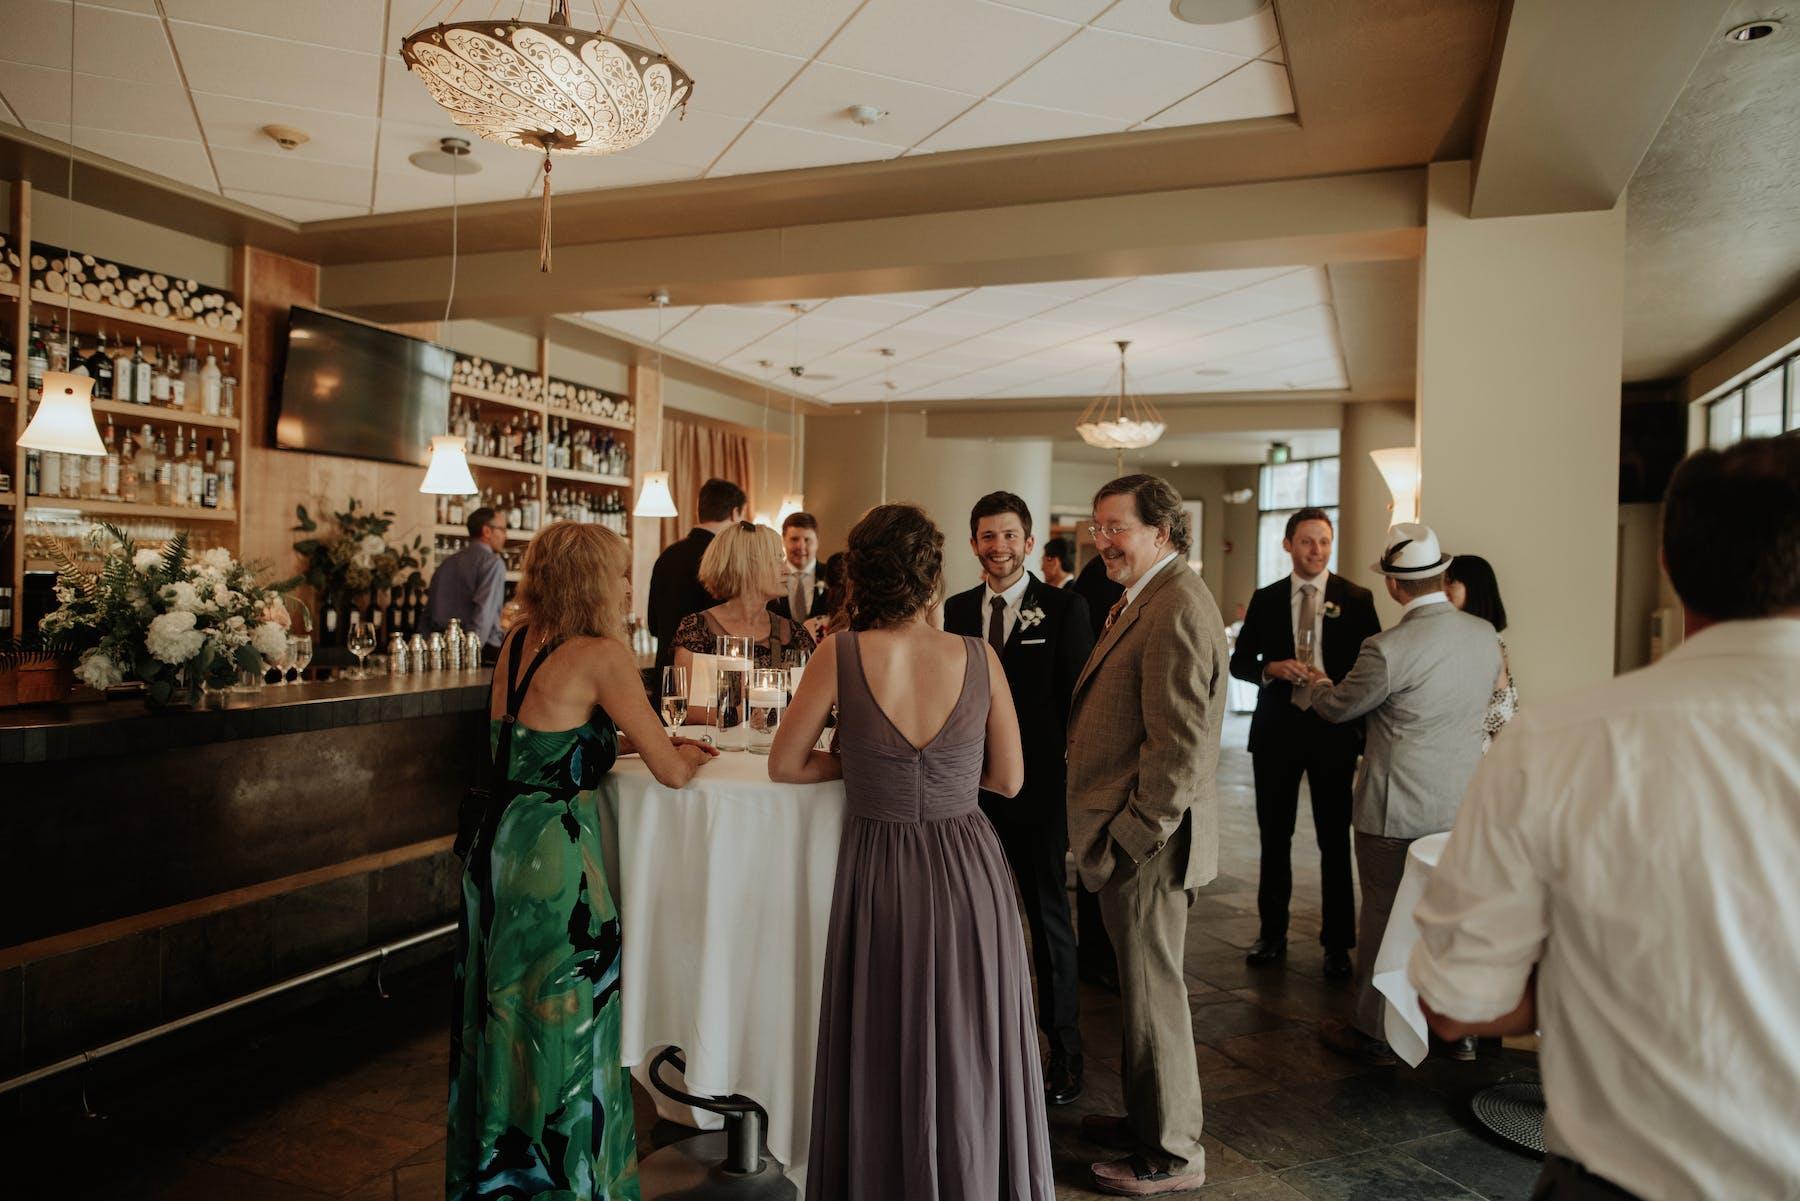 Larkspur Wedding Venue Vail Colorado Mountain Patio Outdoors Bar Cocktail Reception